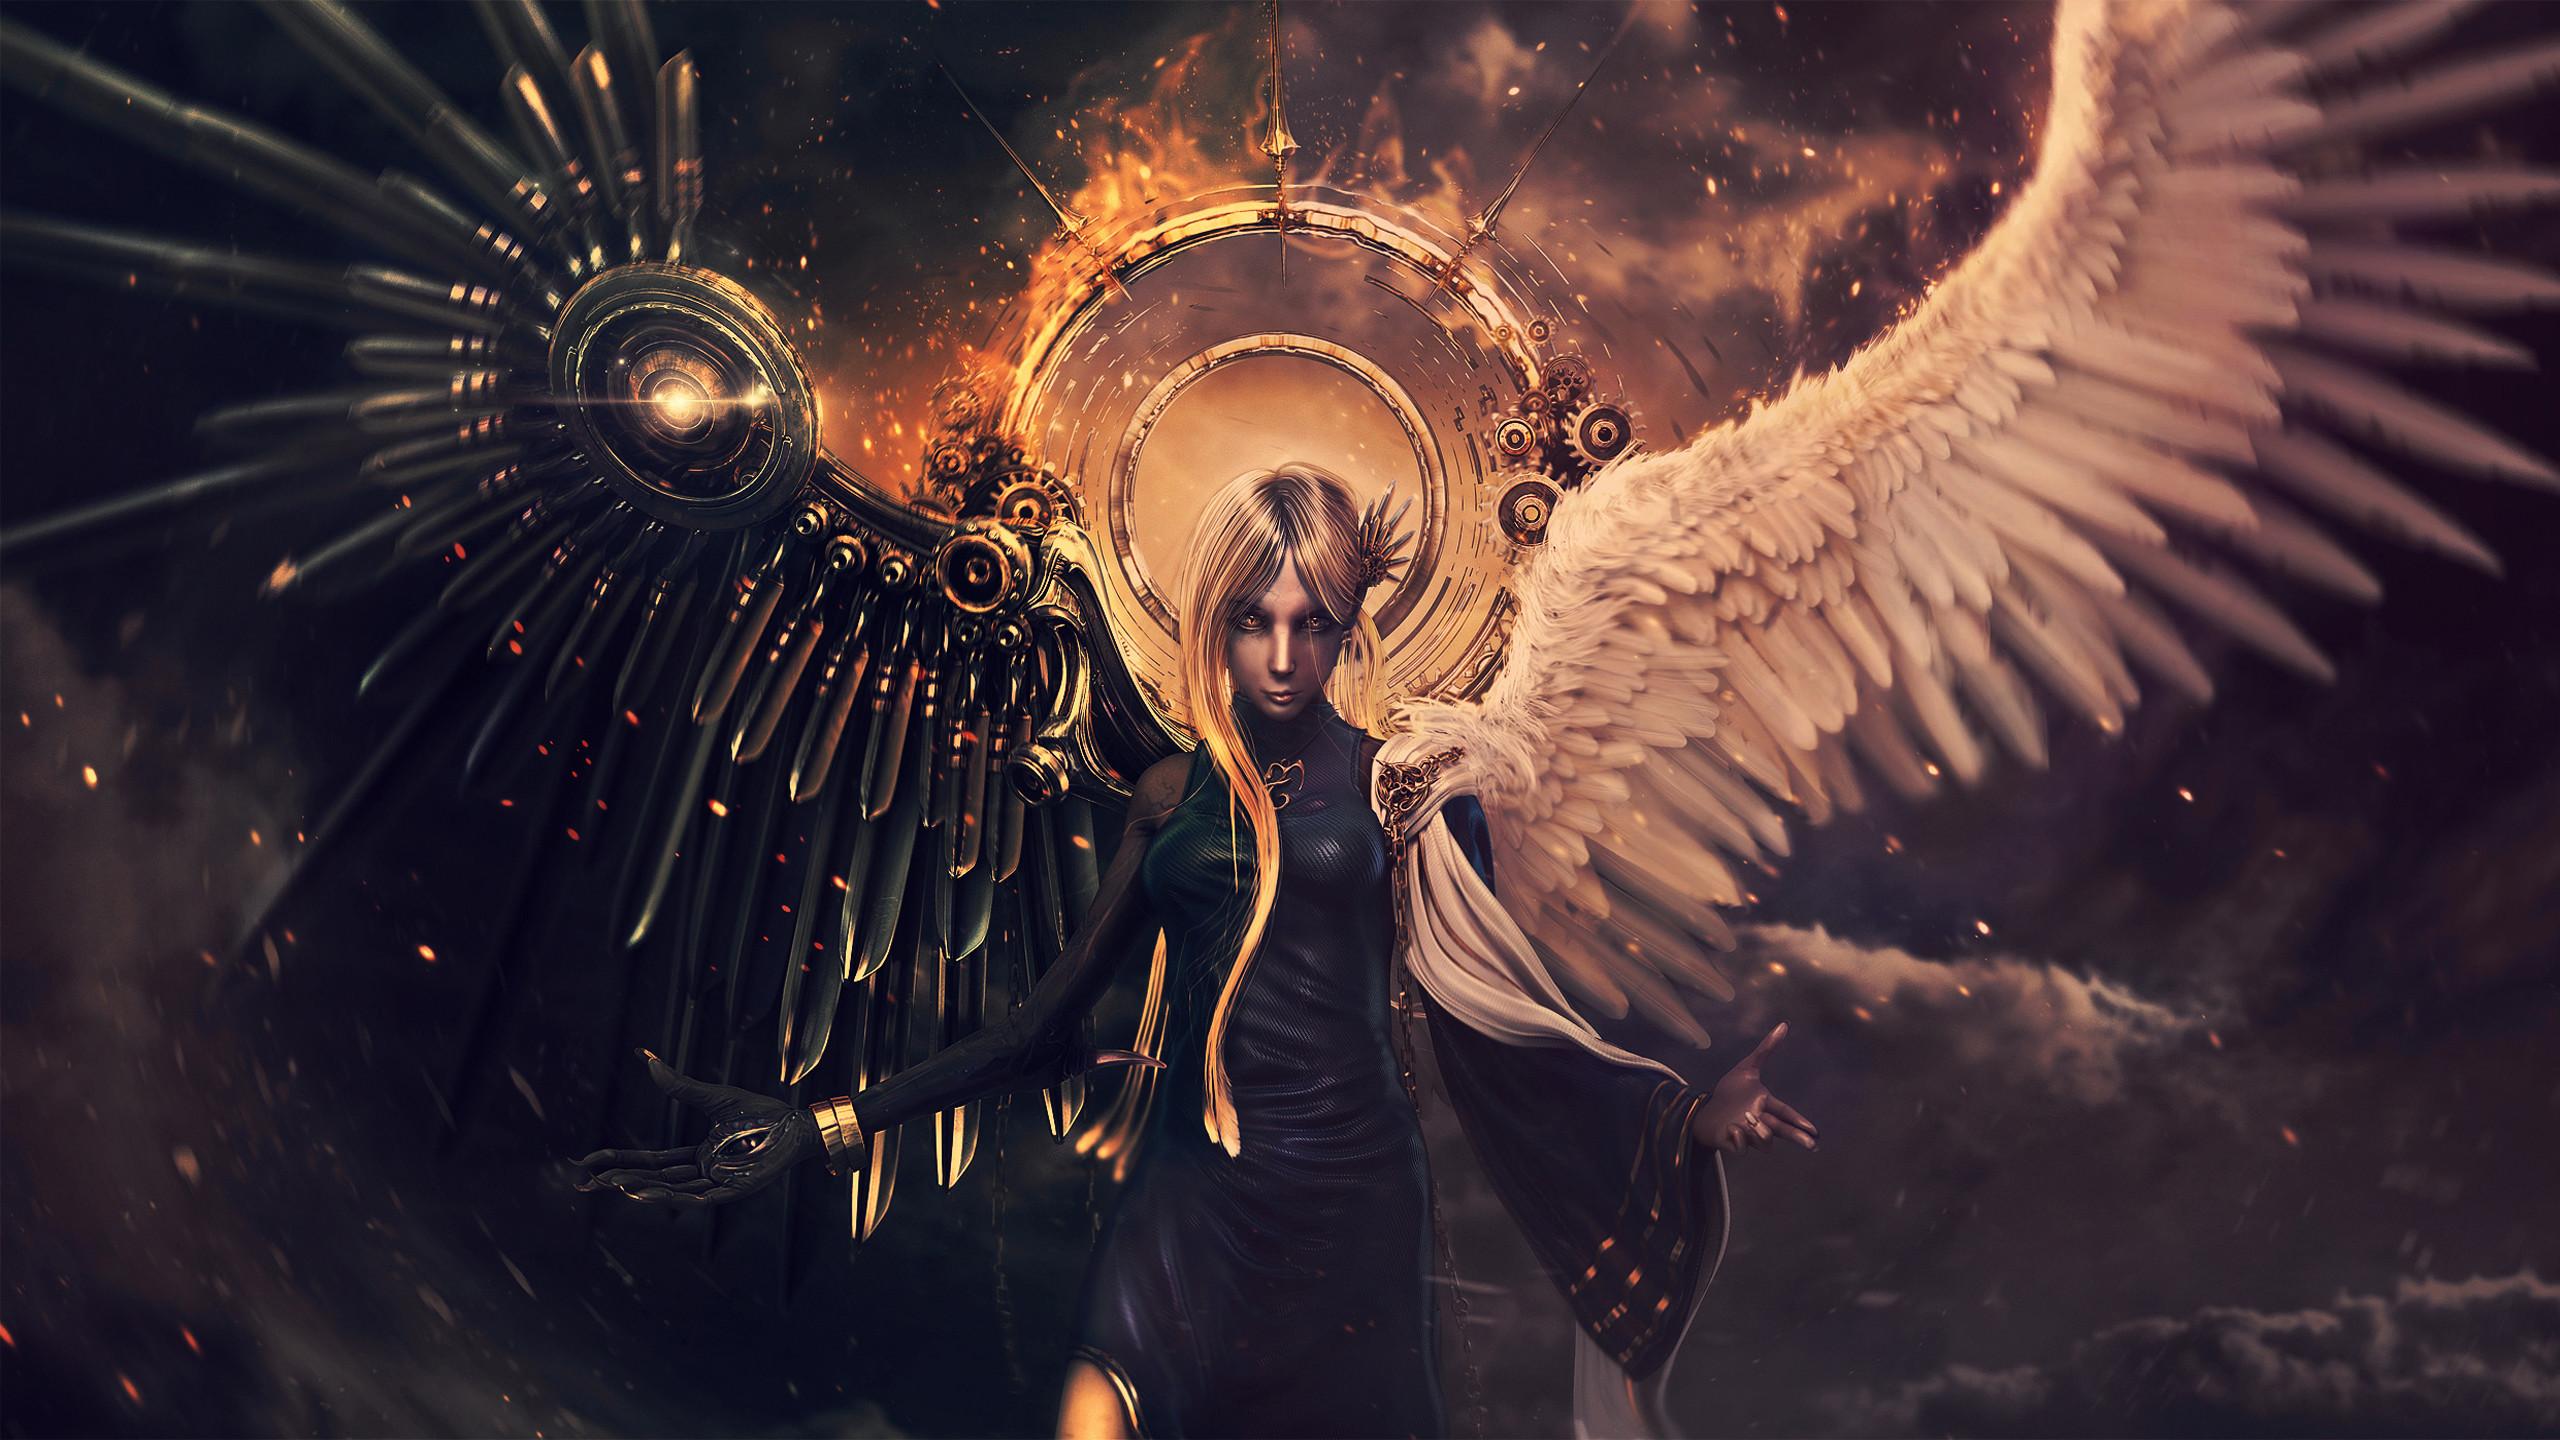 Angel And Demon wallpaper – 1063798